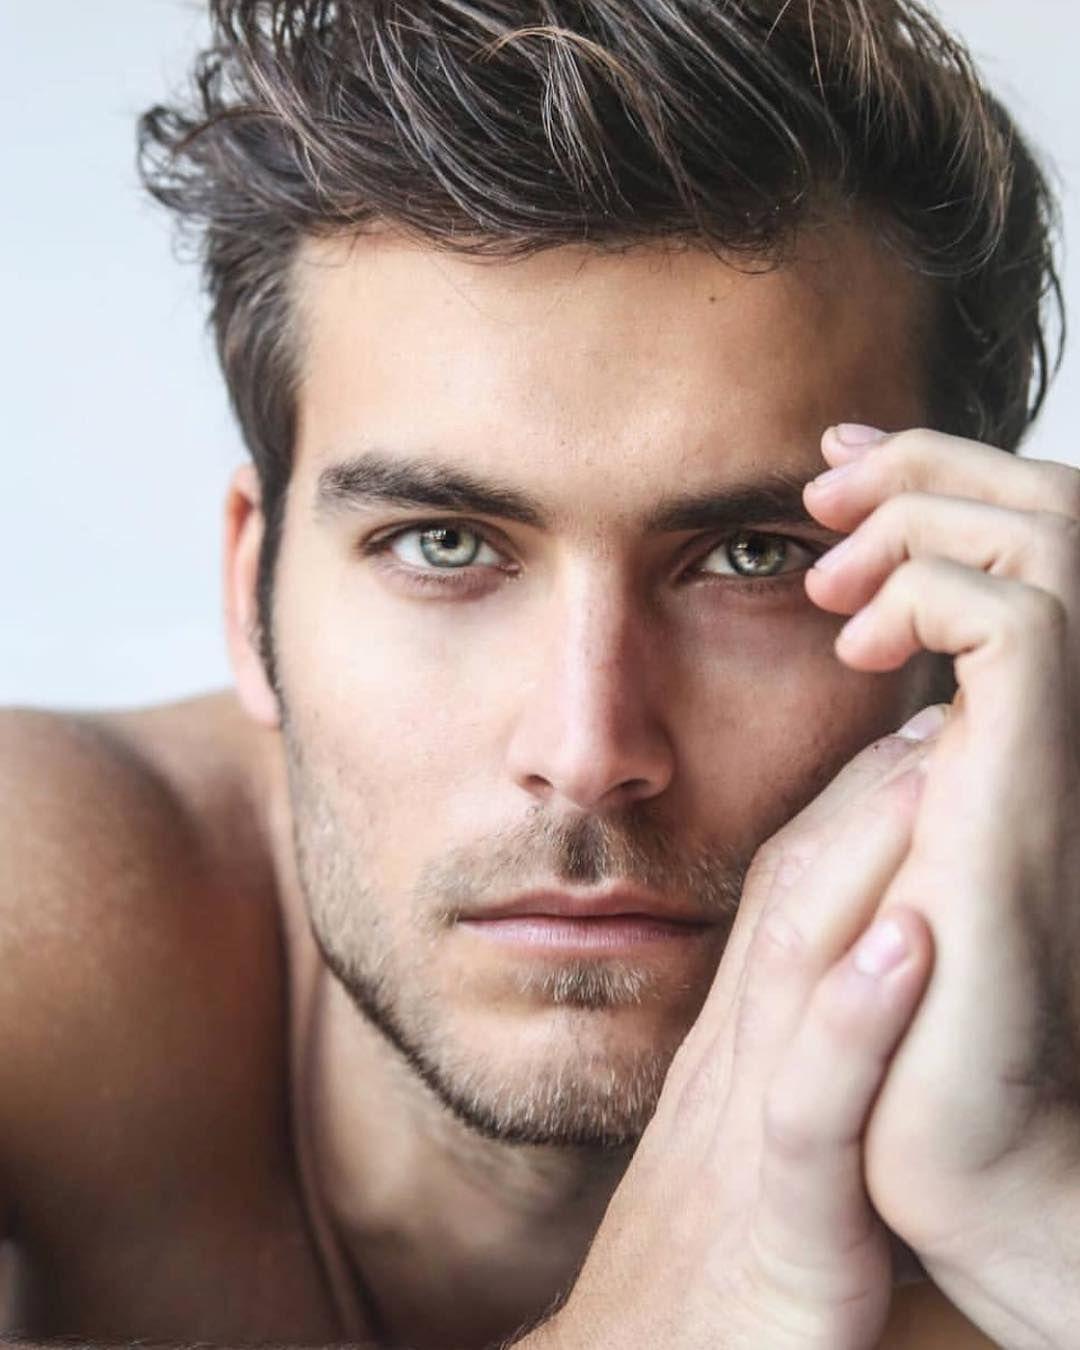 Image May Contain 1 Person, Closeup  Beautiful Men Faces -9125